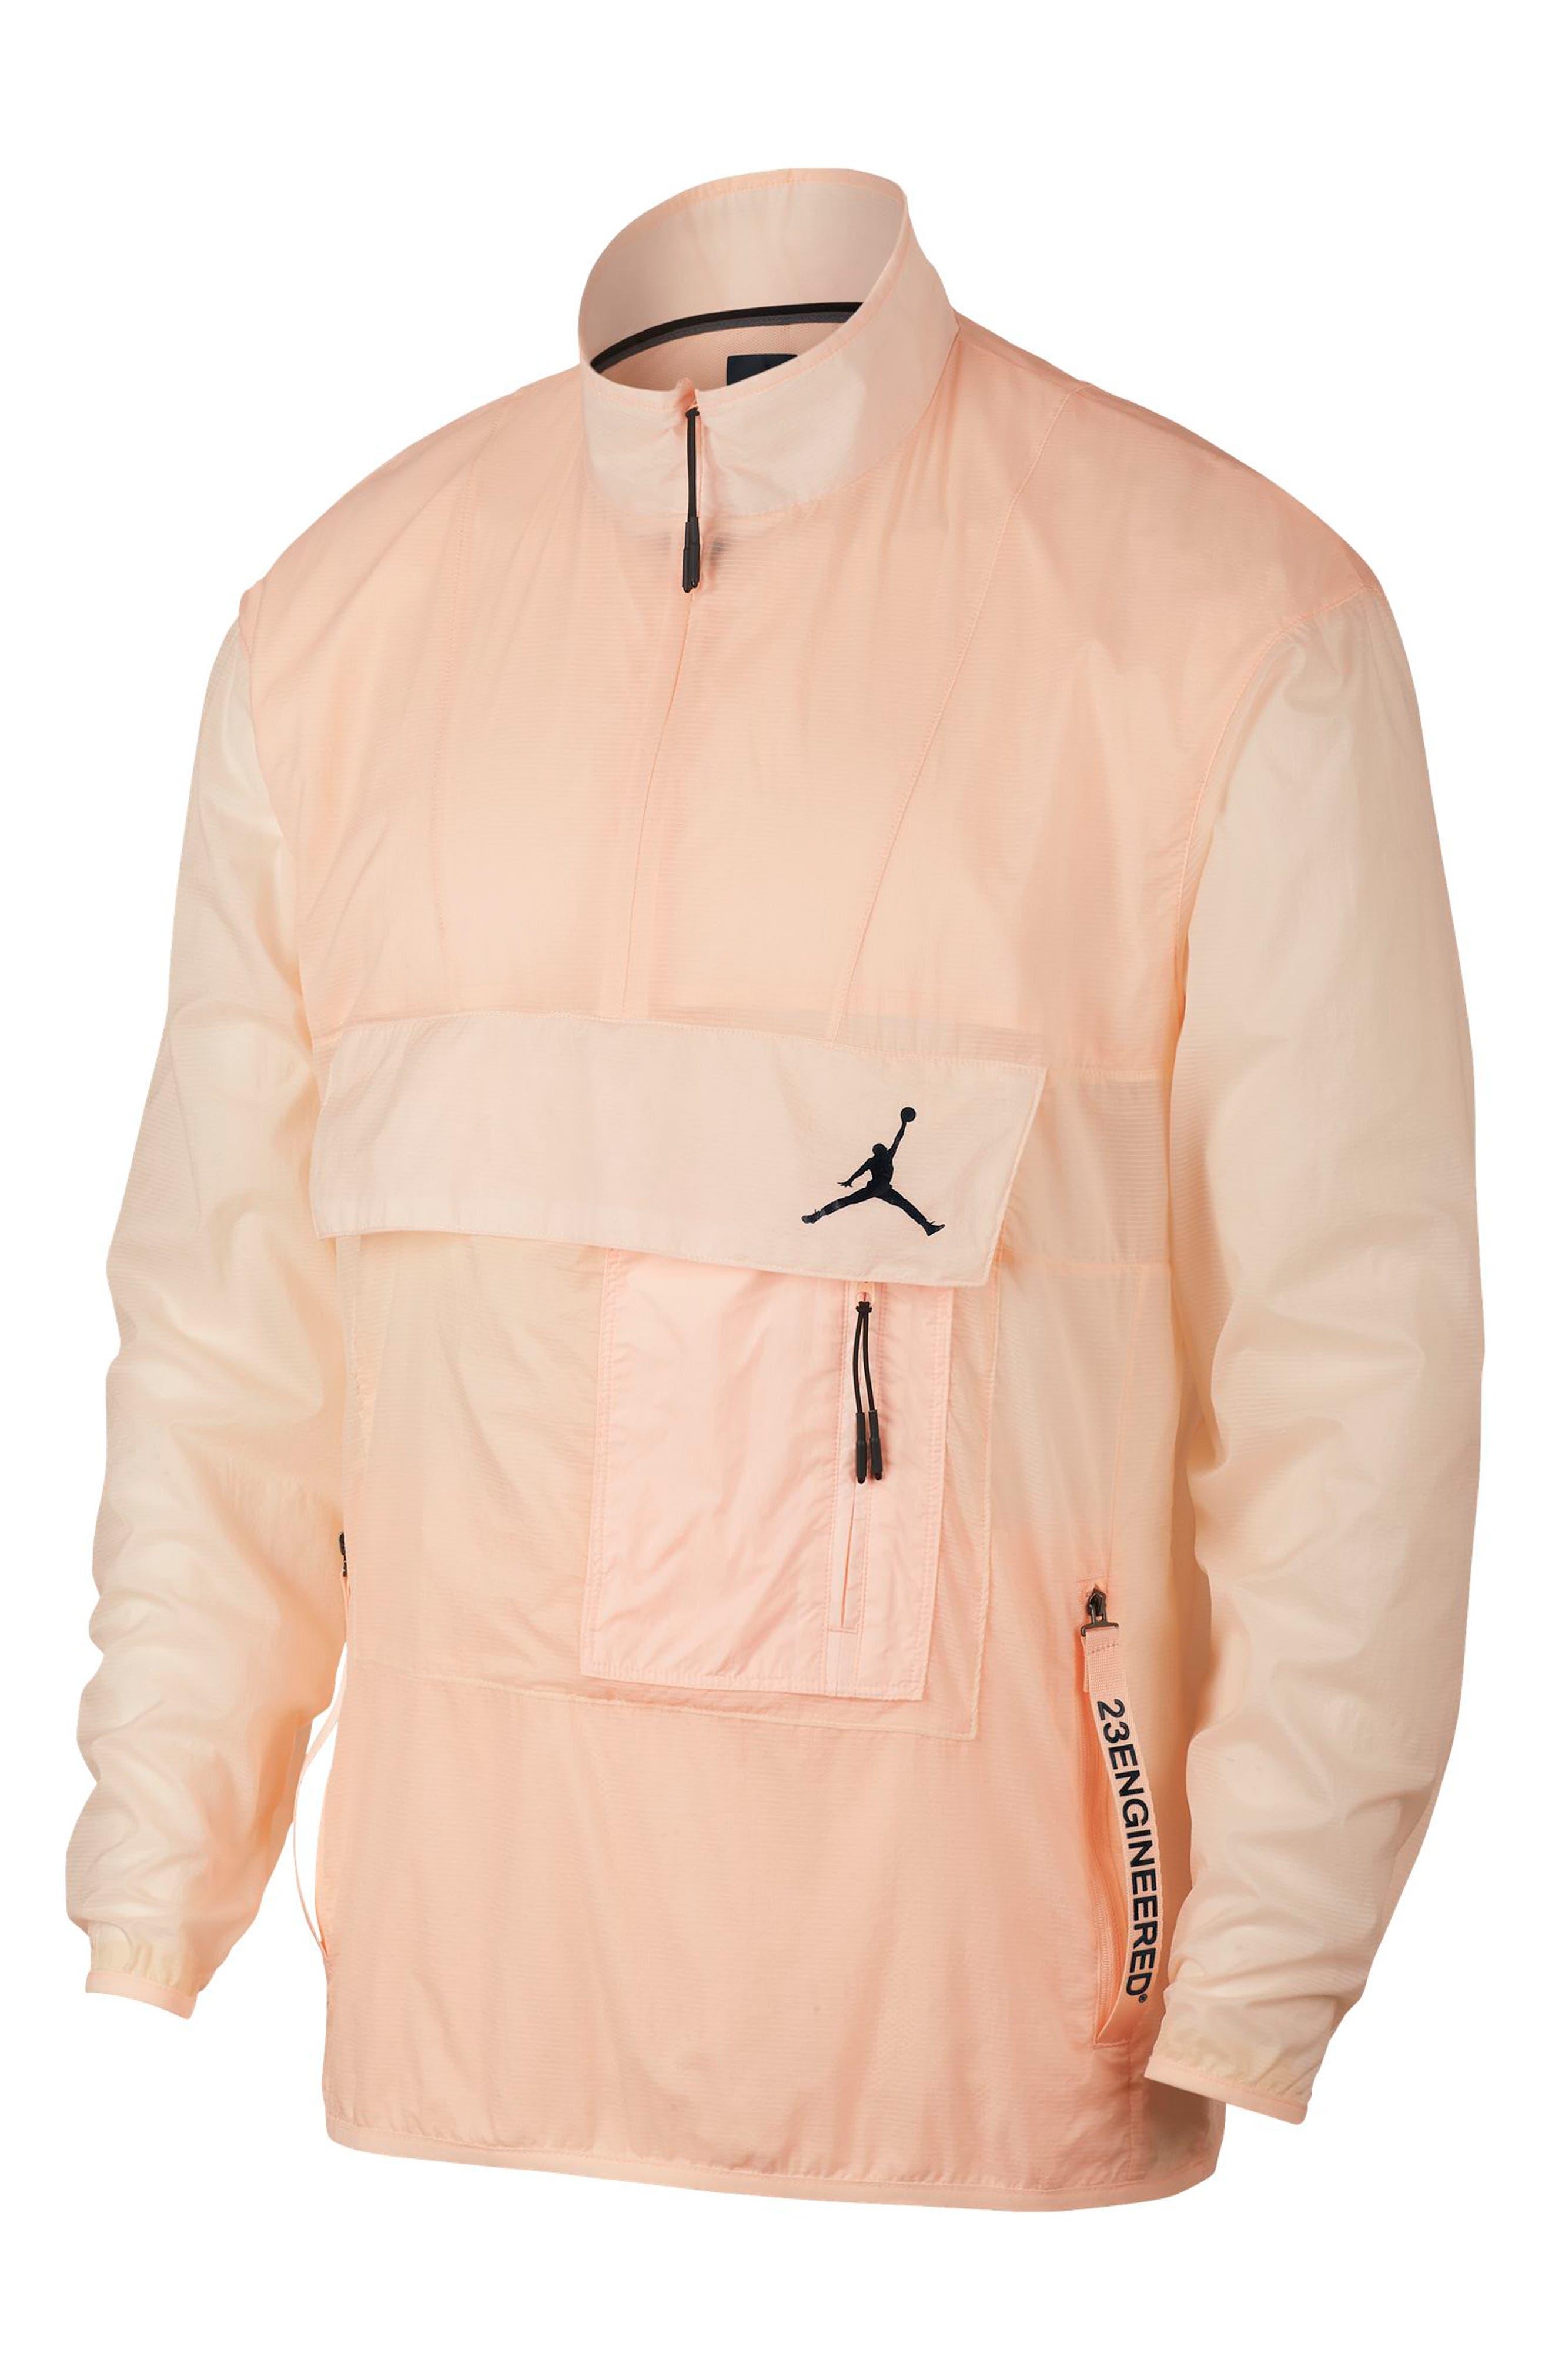 Jordan 23 Engineered Training Jacket, Coral